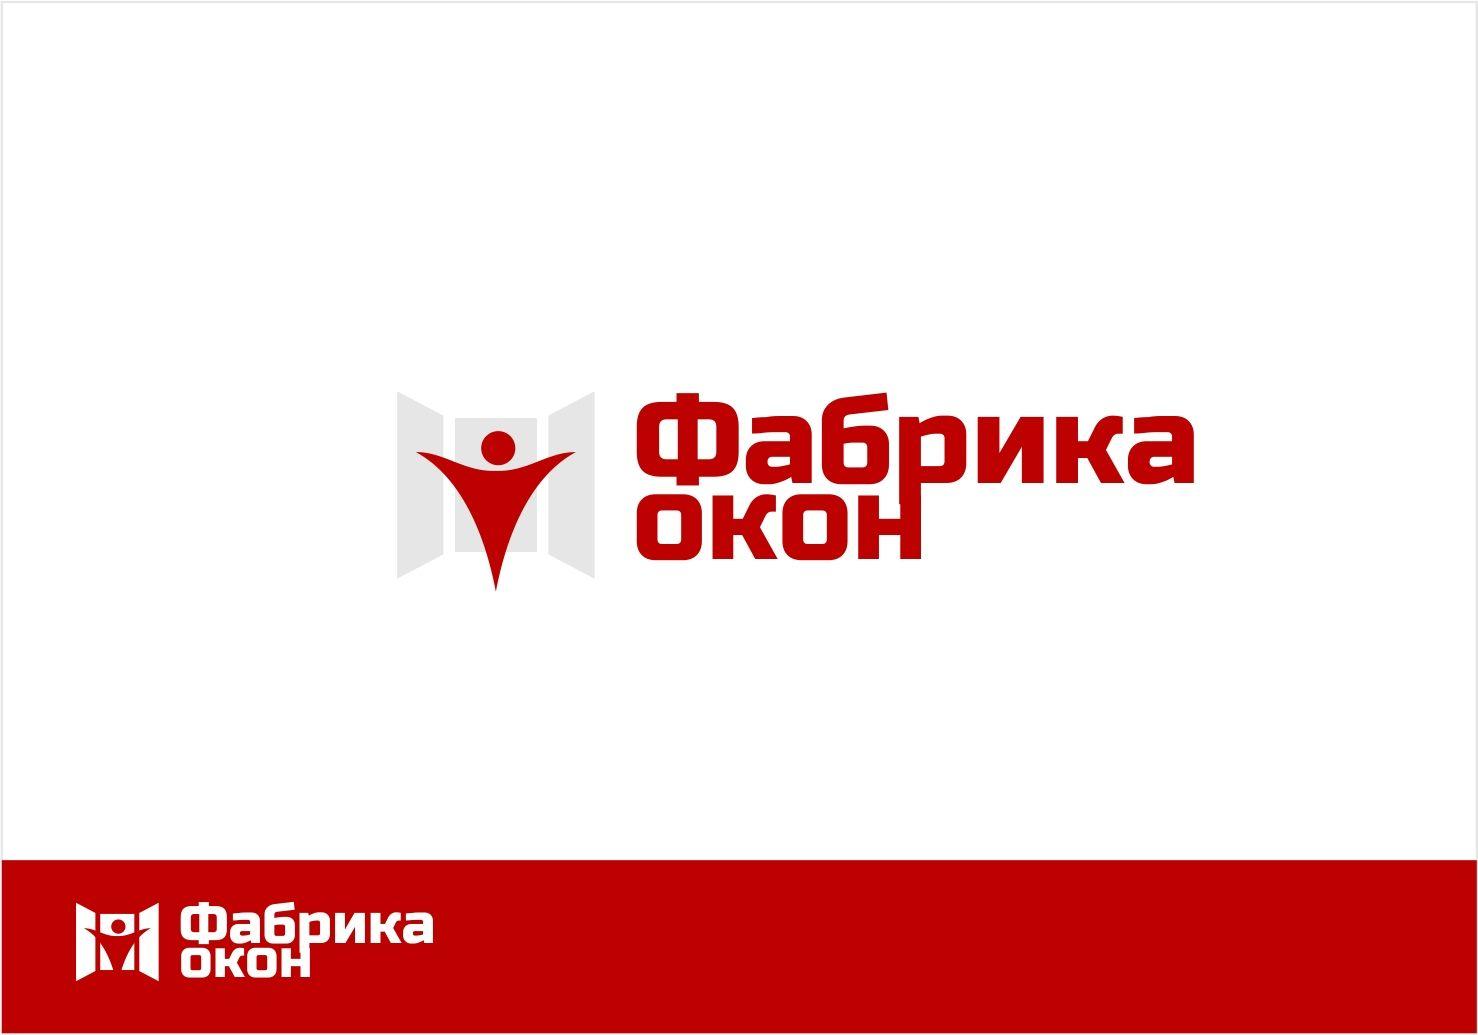 Логотип для Фабрика окон - дизайнер kras-sky